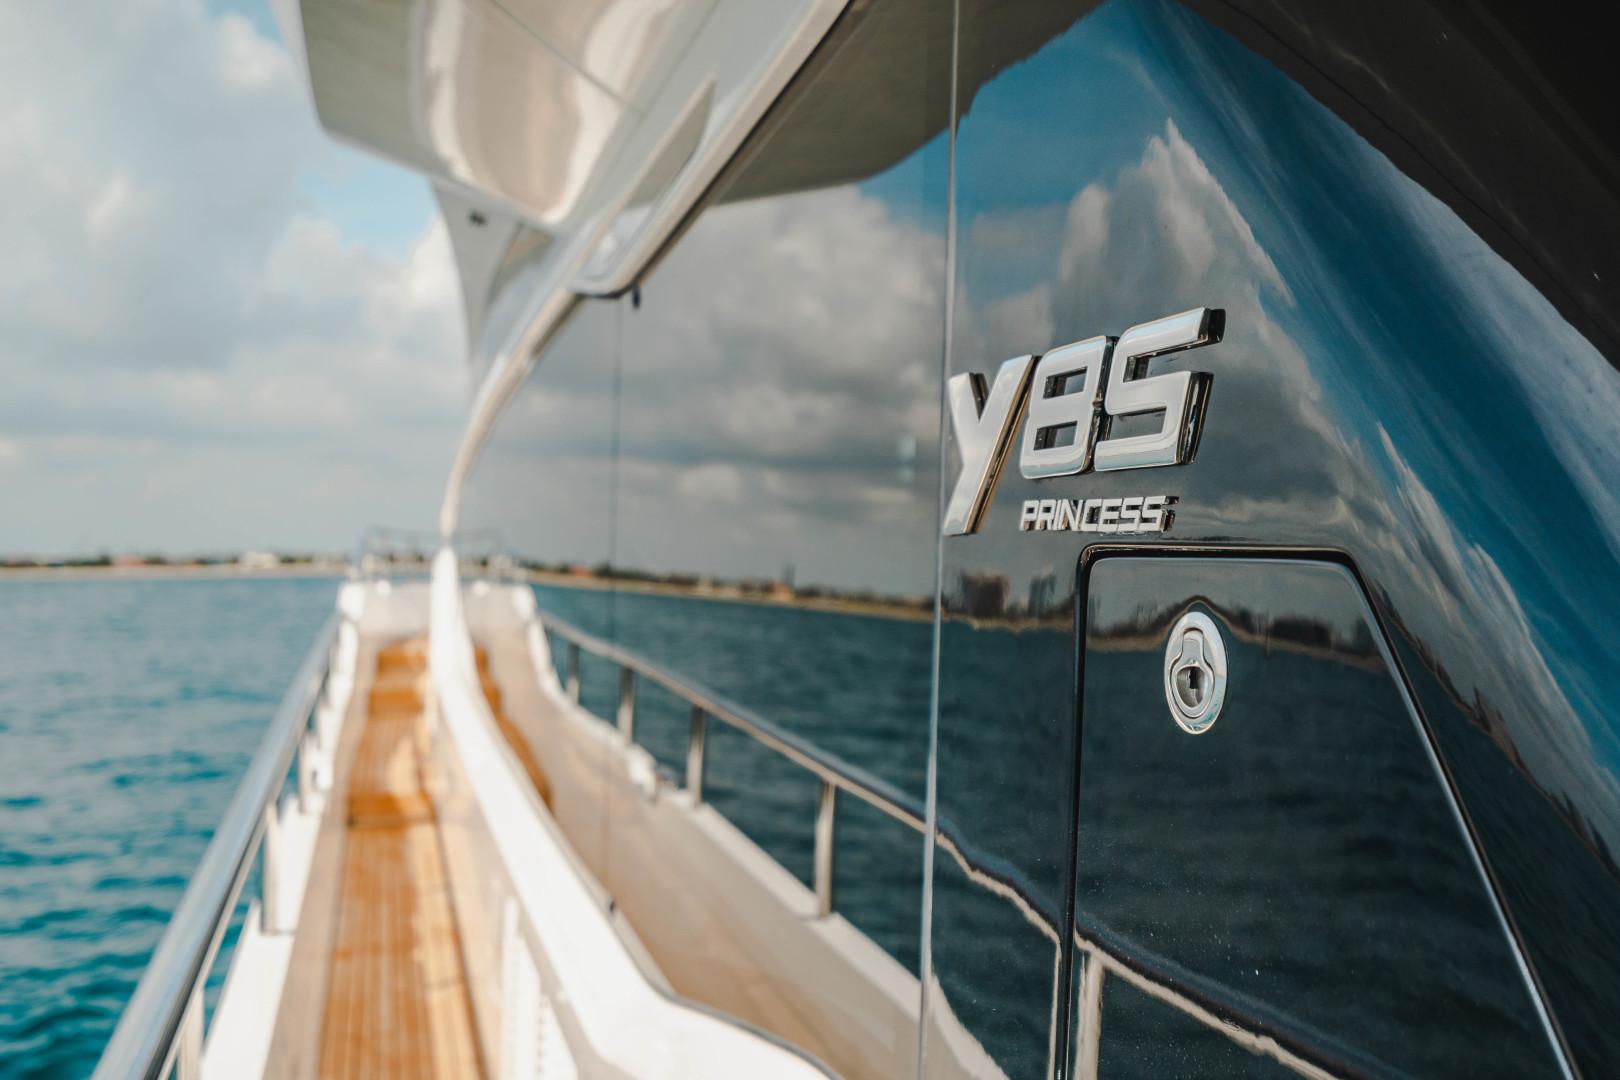 Princess-Y85  2019-Splash Delray Beach-Florida-United States-1631616 | Thumbnail